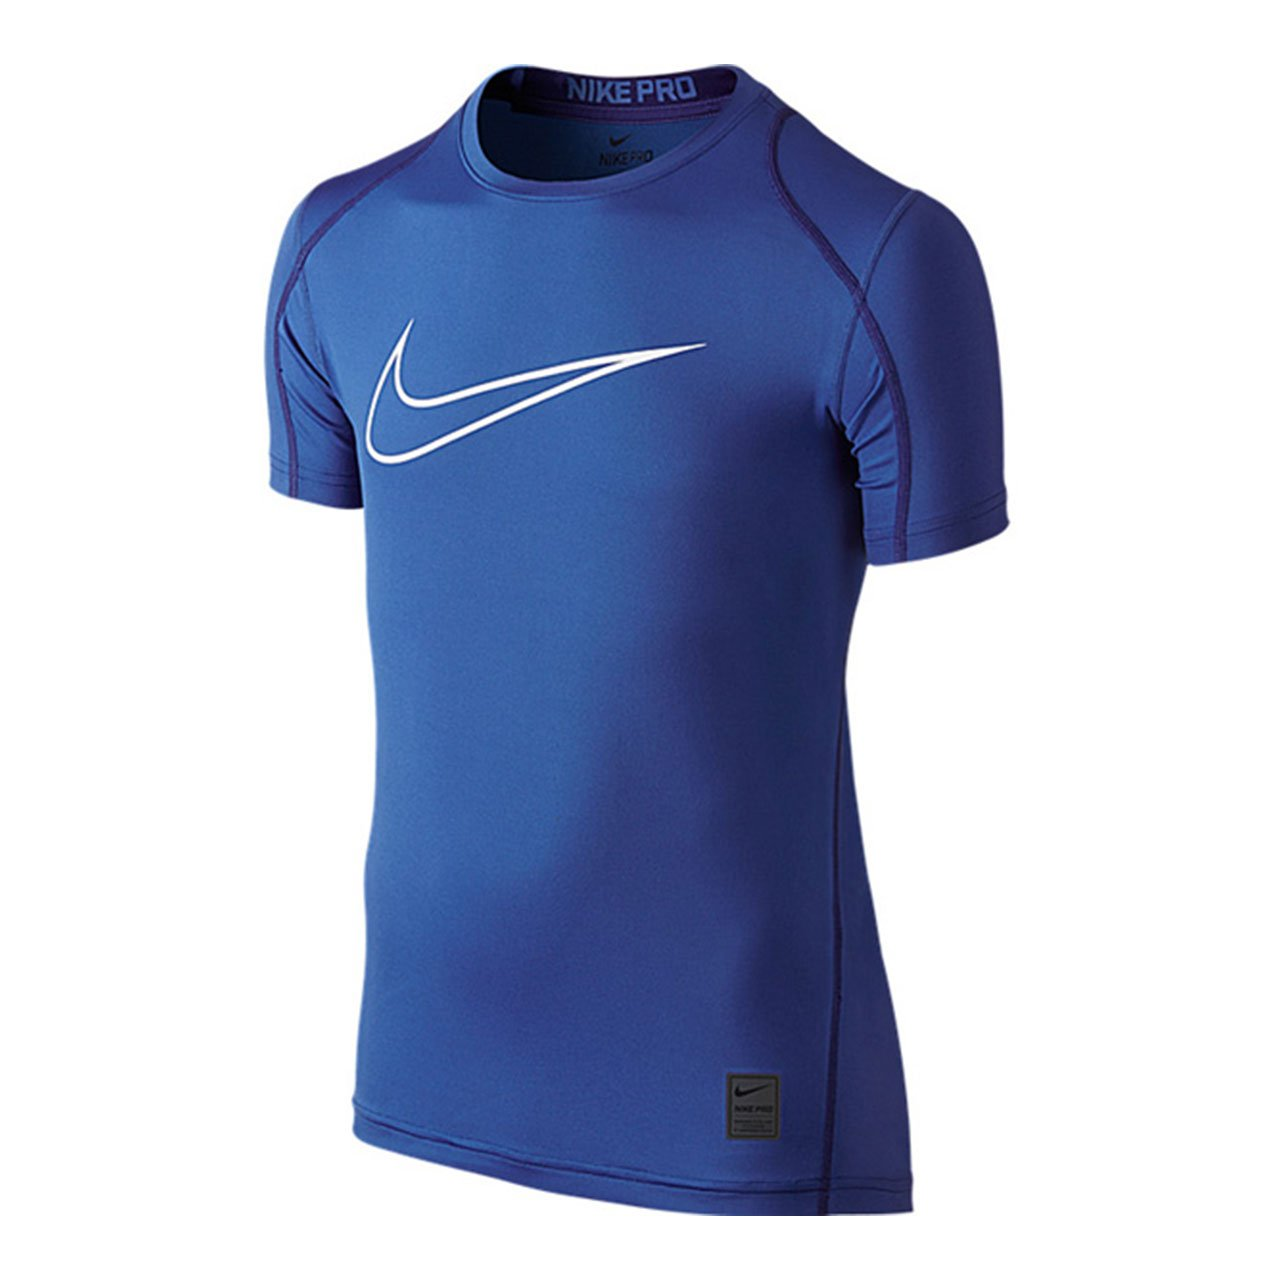 3427706bda7d1 Get Quotations · NIKE Boys  Pro Fitted HBR Short Sleeve Shirt